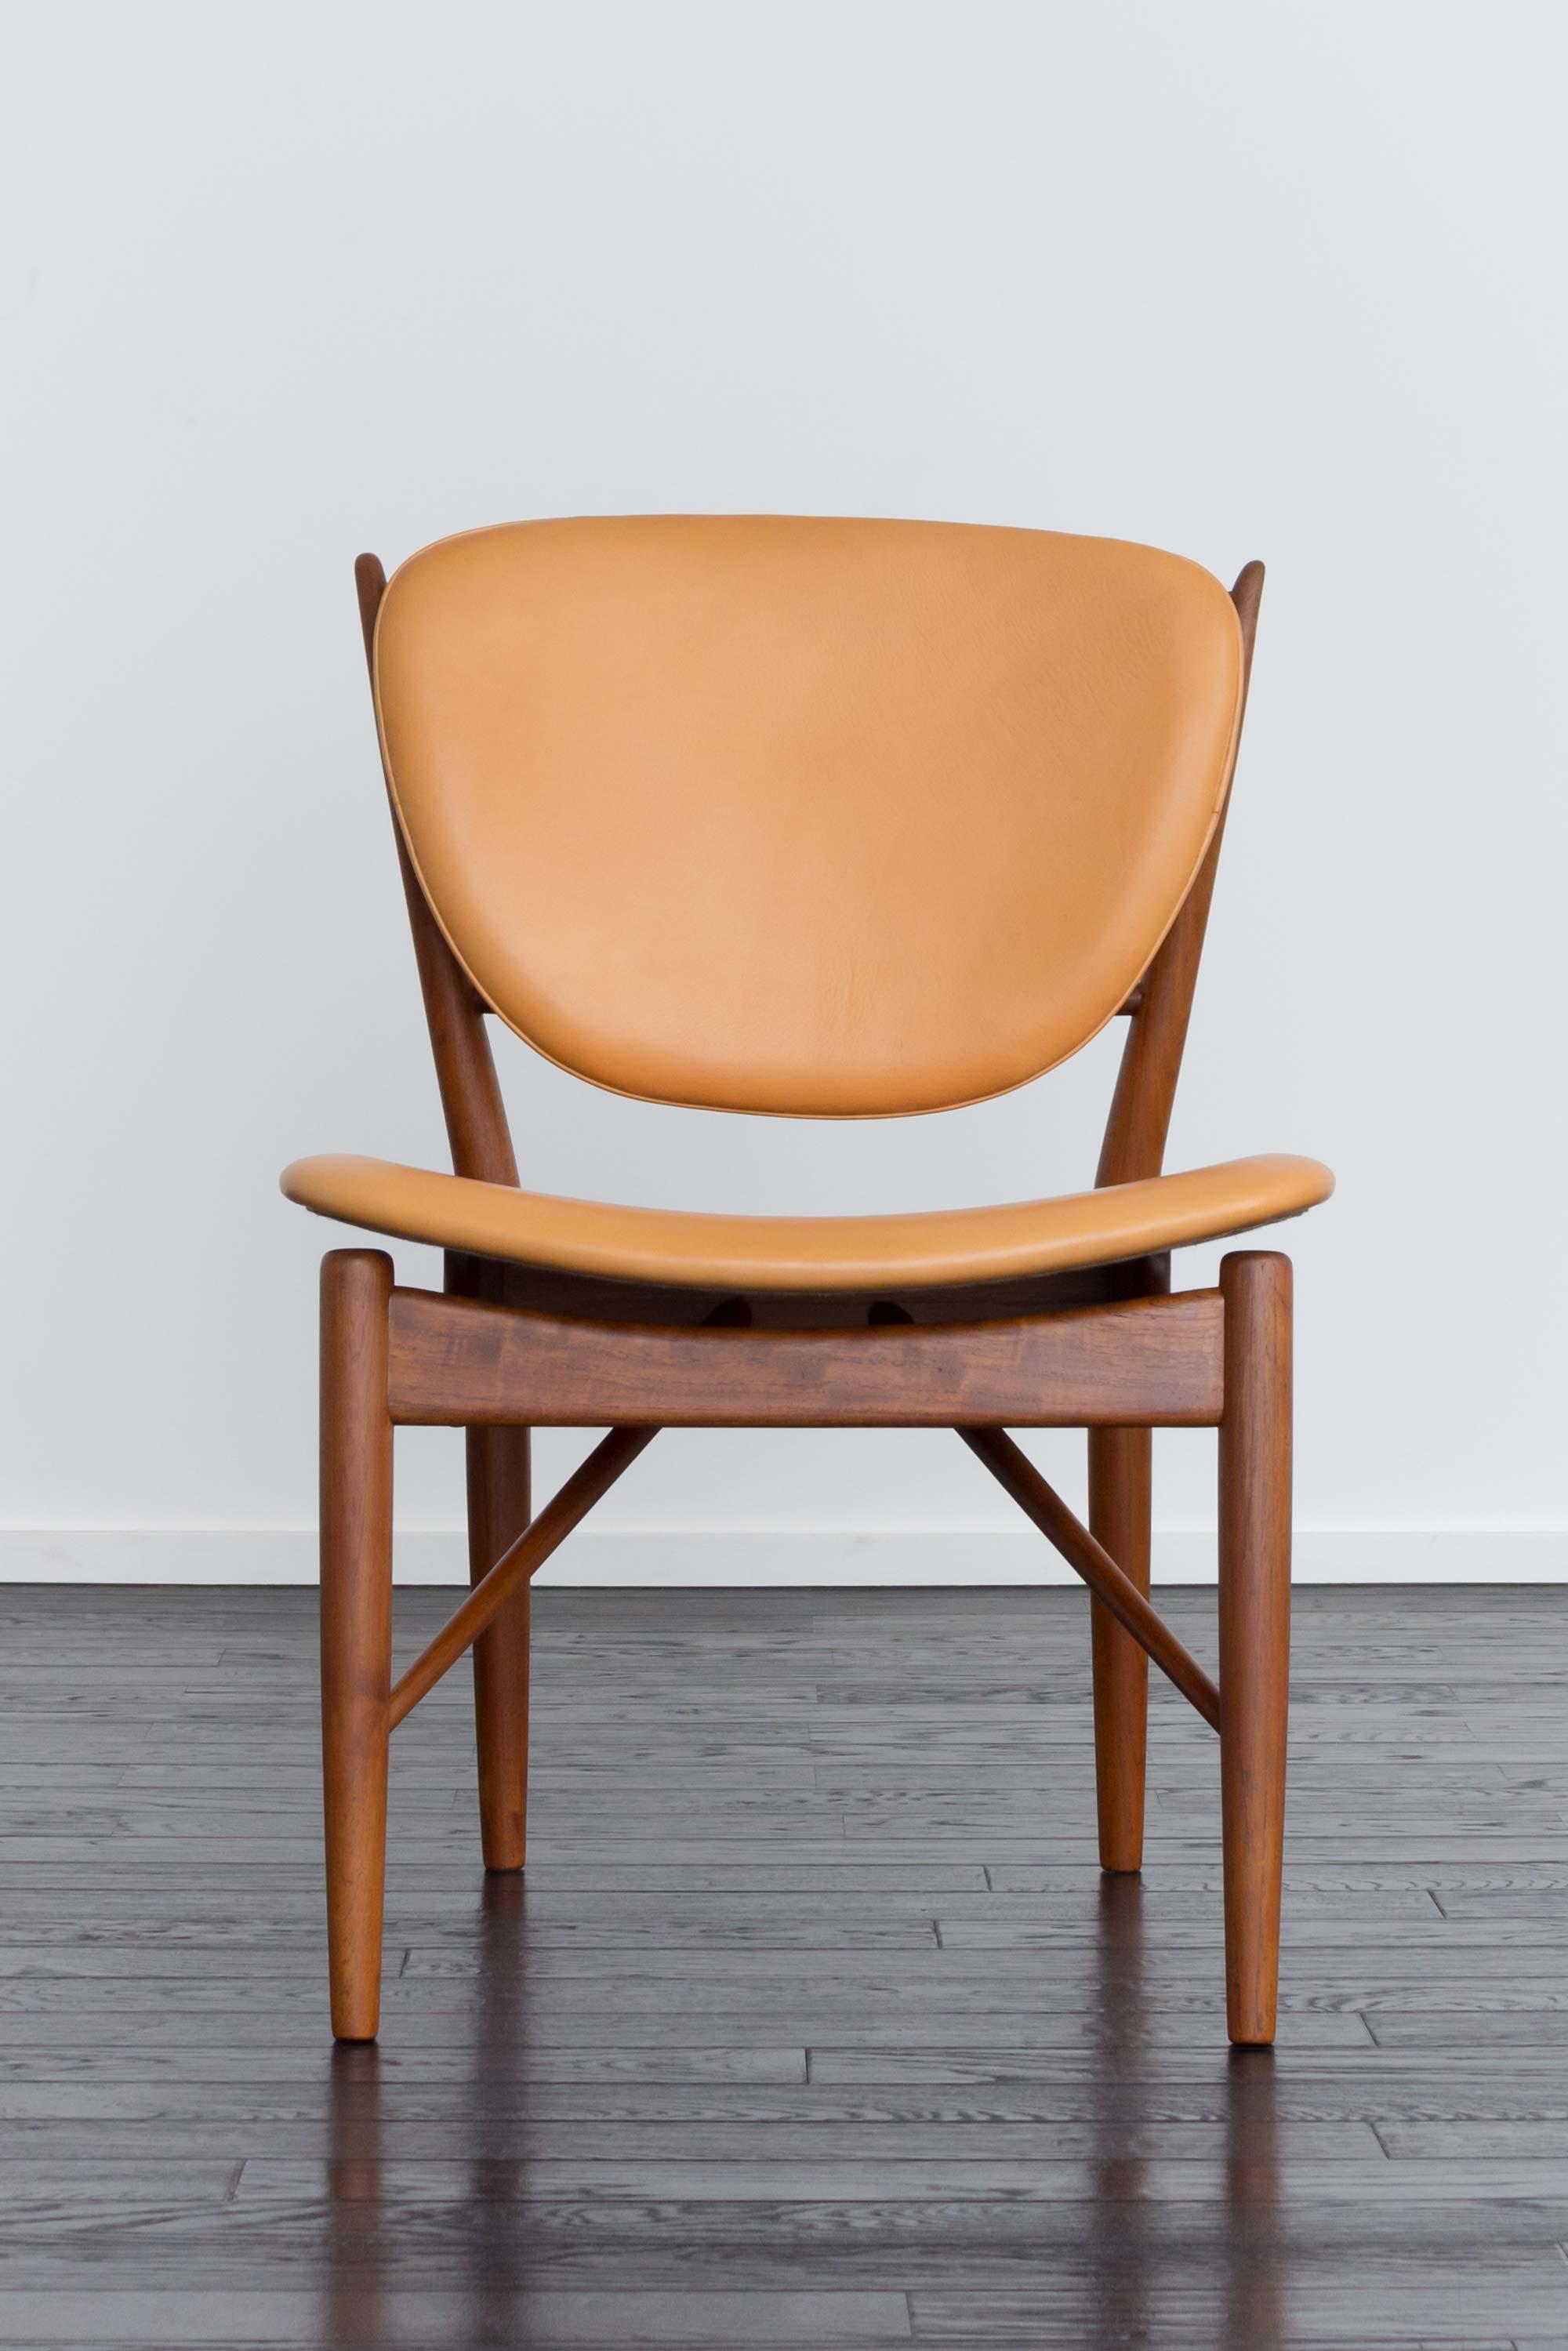 NV51 Chair by Finn Juhl